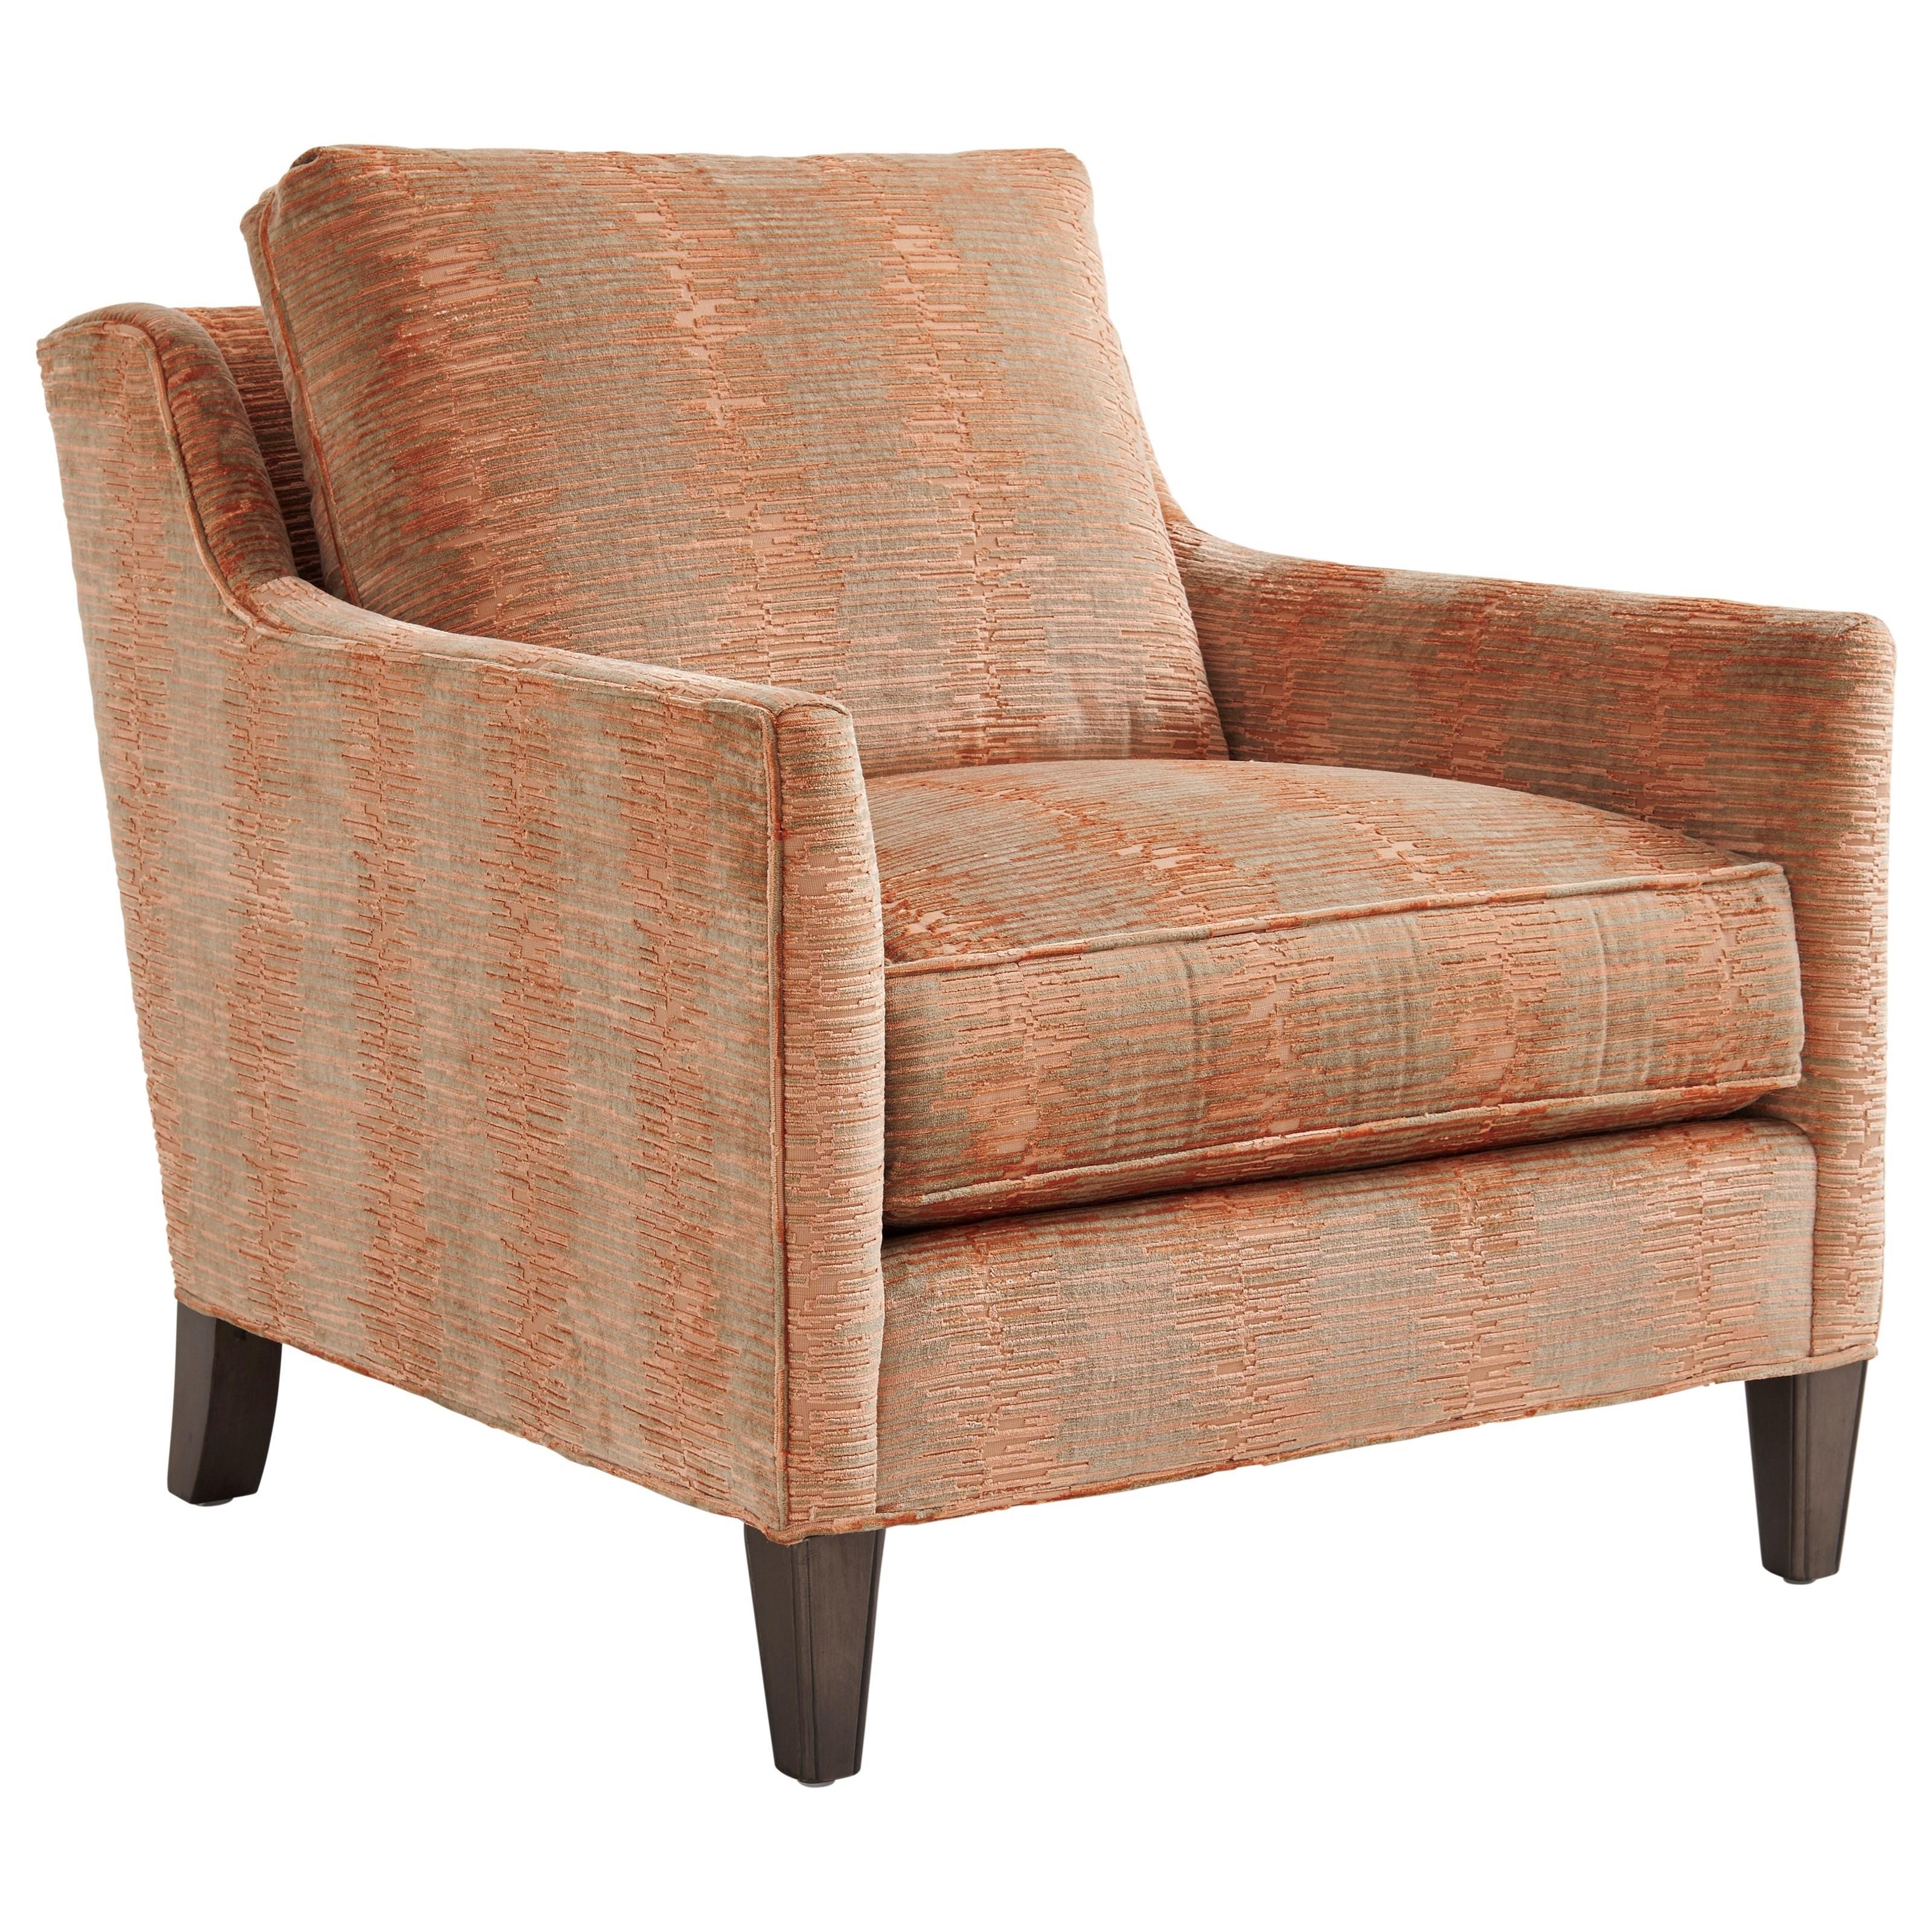 Ariana Turin Chair by Lexington at Johnny Janosik